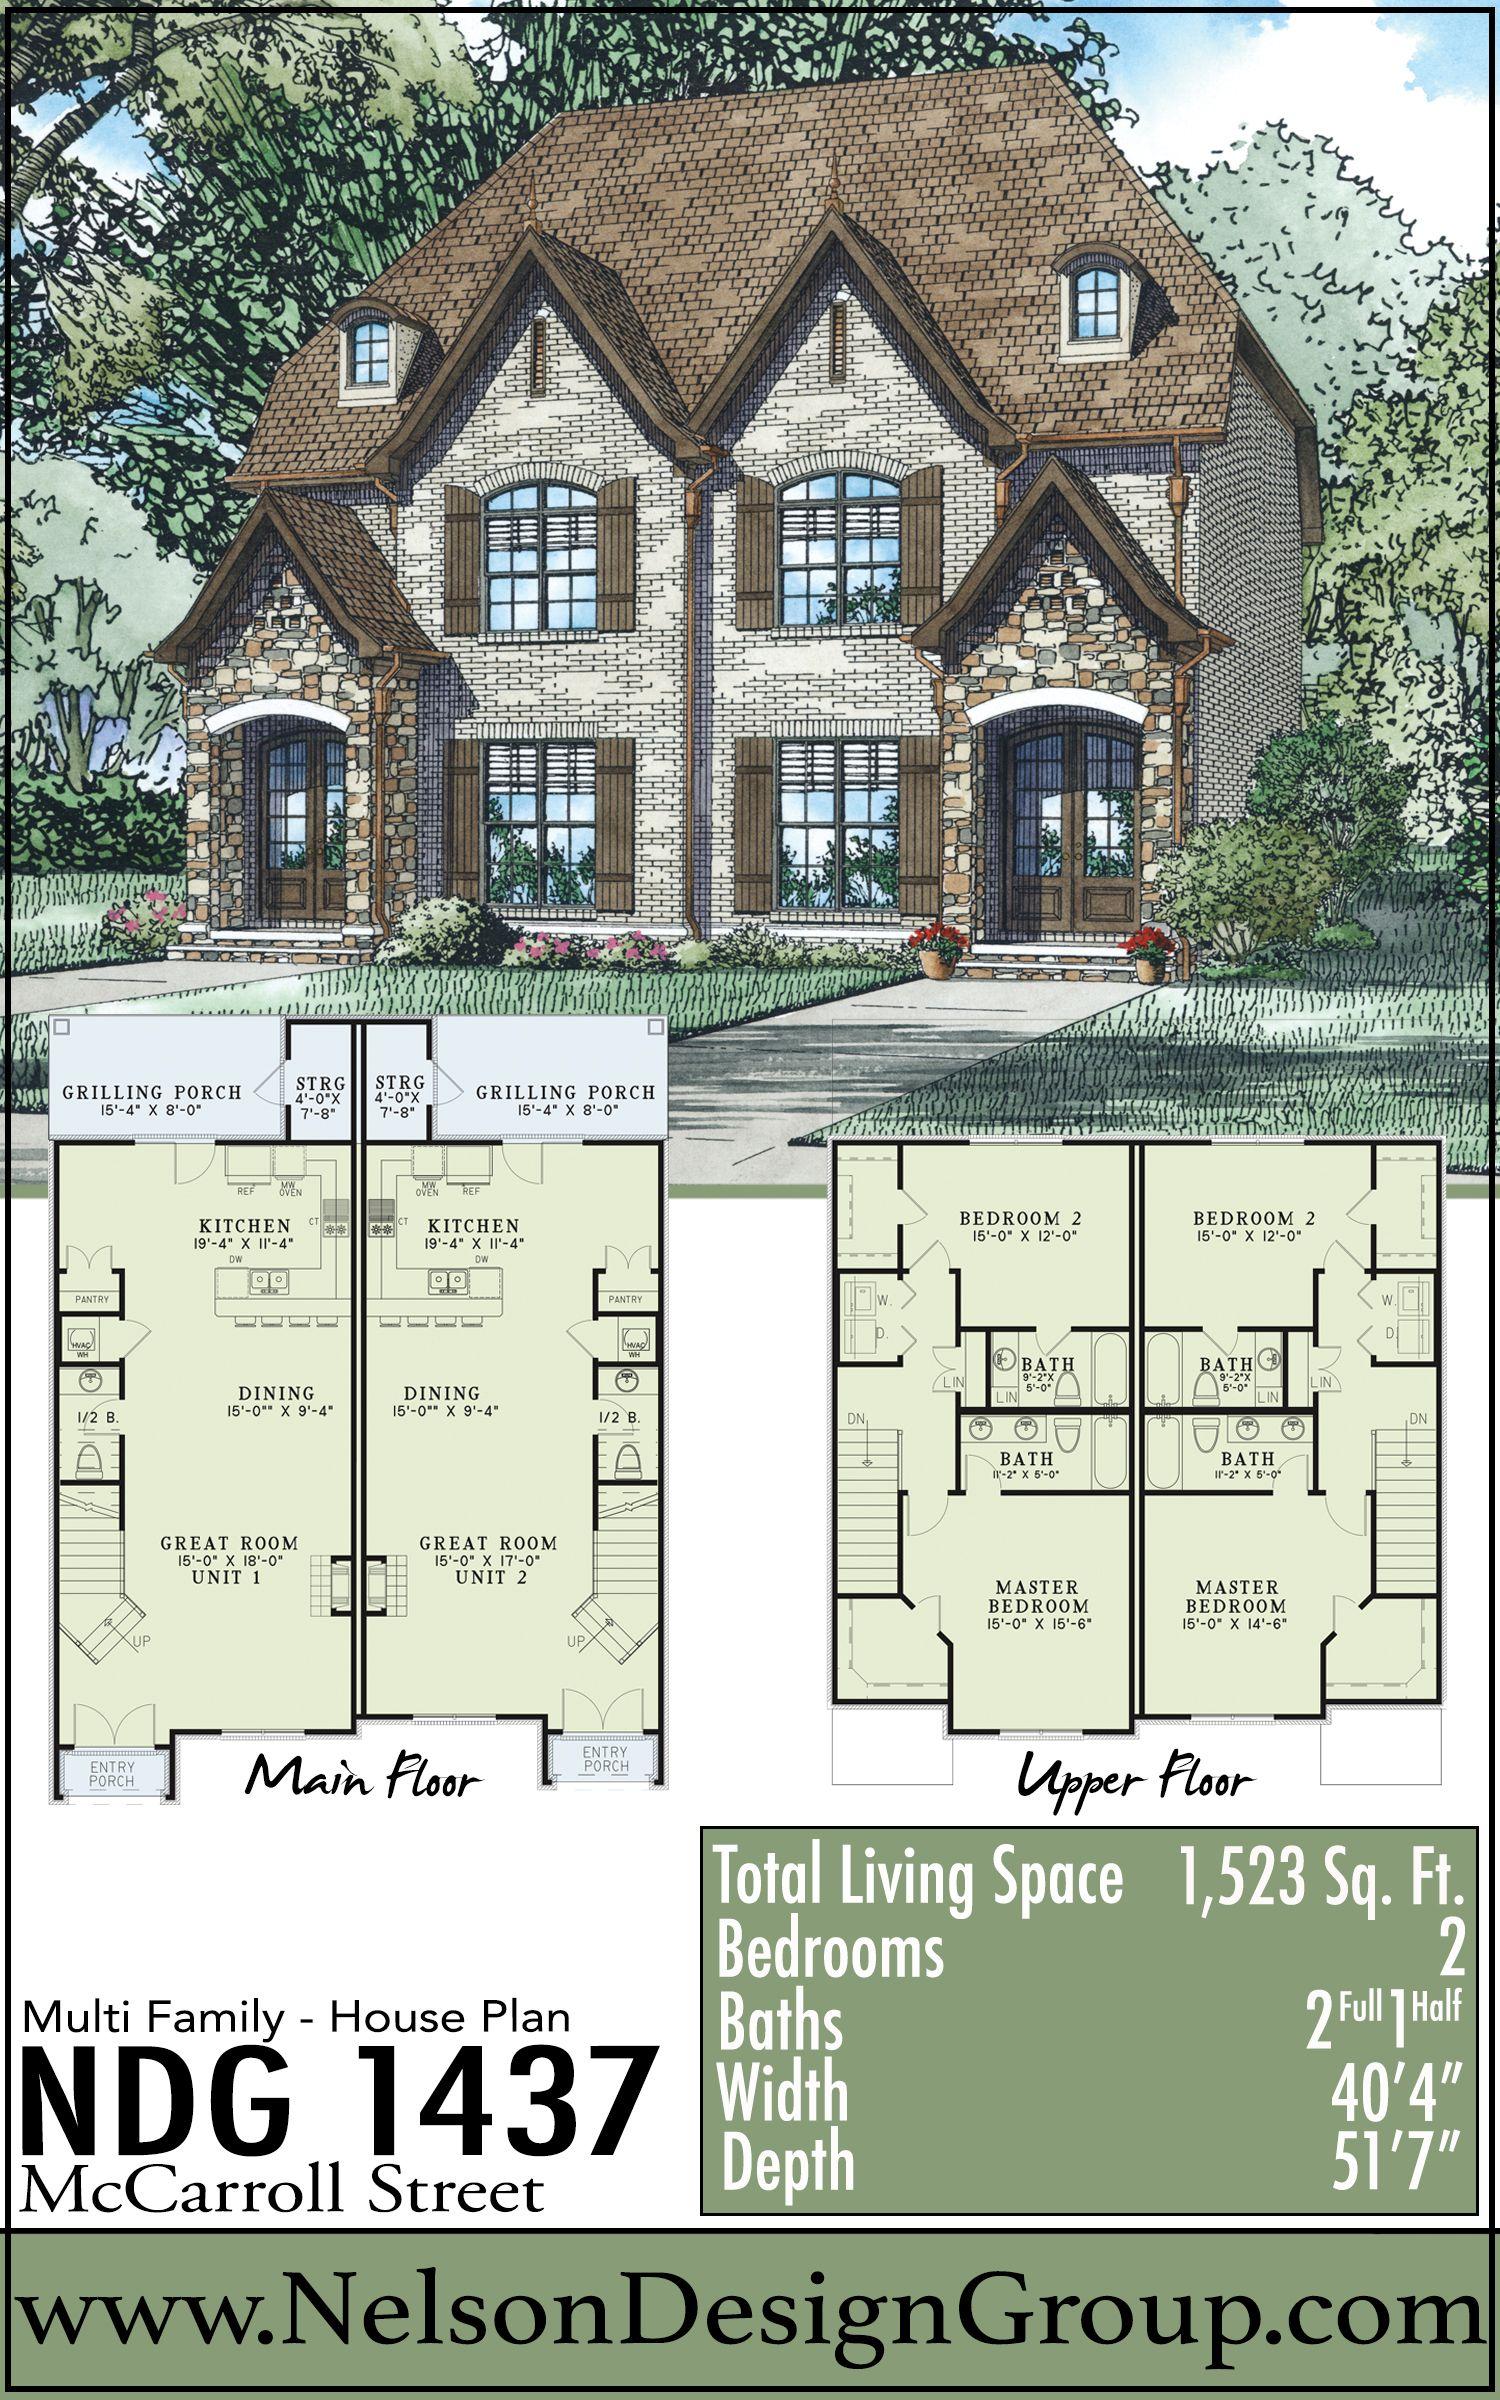 Houses House Home Homes Houseplan Houseplans Homeplan Homeplans Dreamhome Nexthome Nexthouse Family House Plans Sims House Plans House Layout Plans